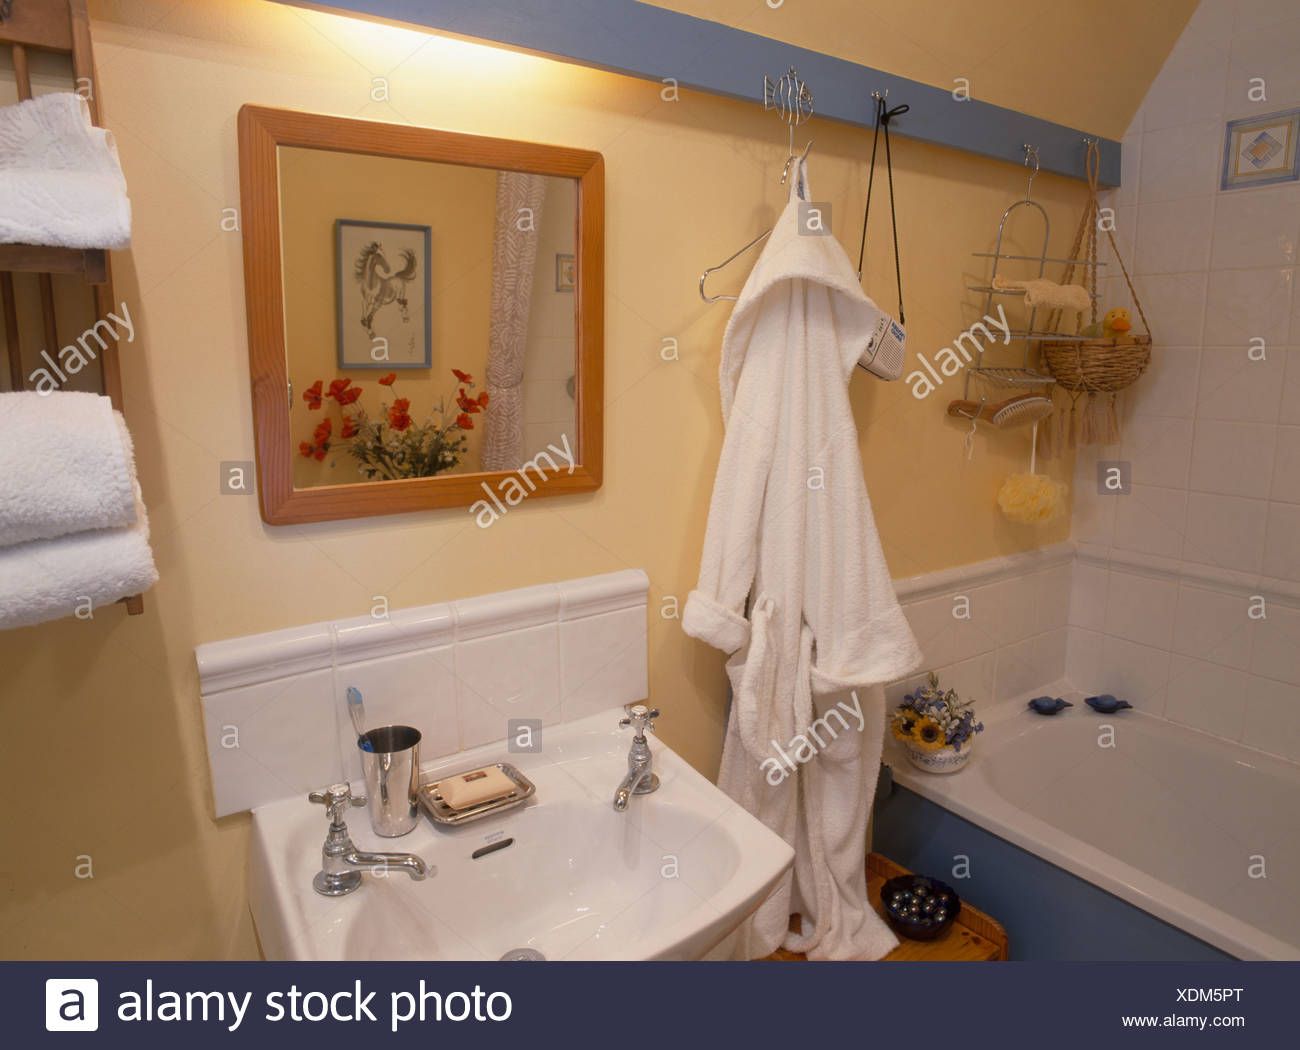 White bathrobe hanging on blue beam in yellow attic bathroom